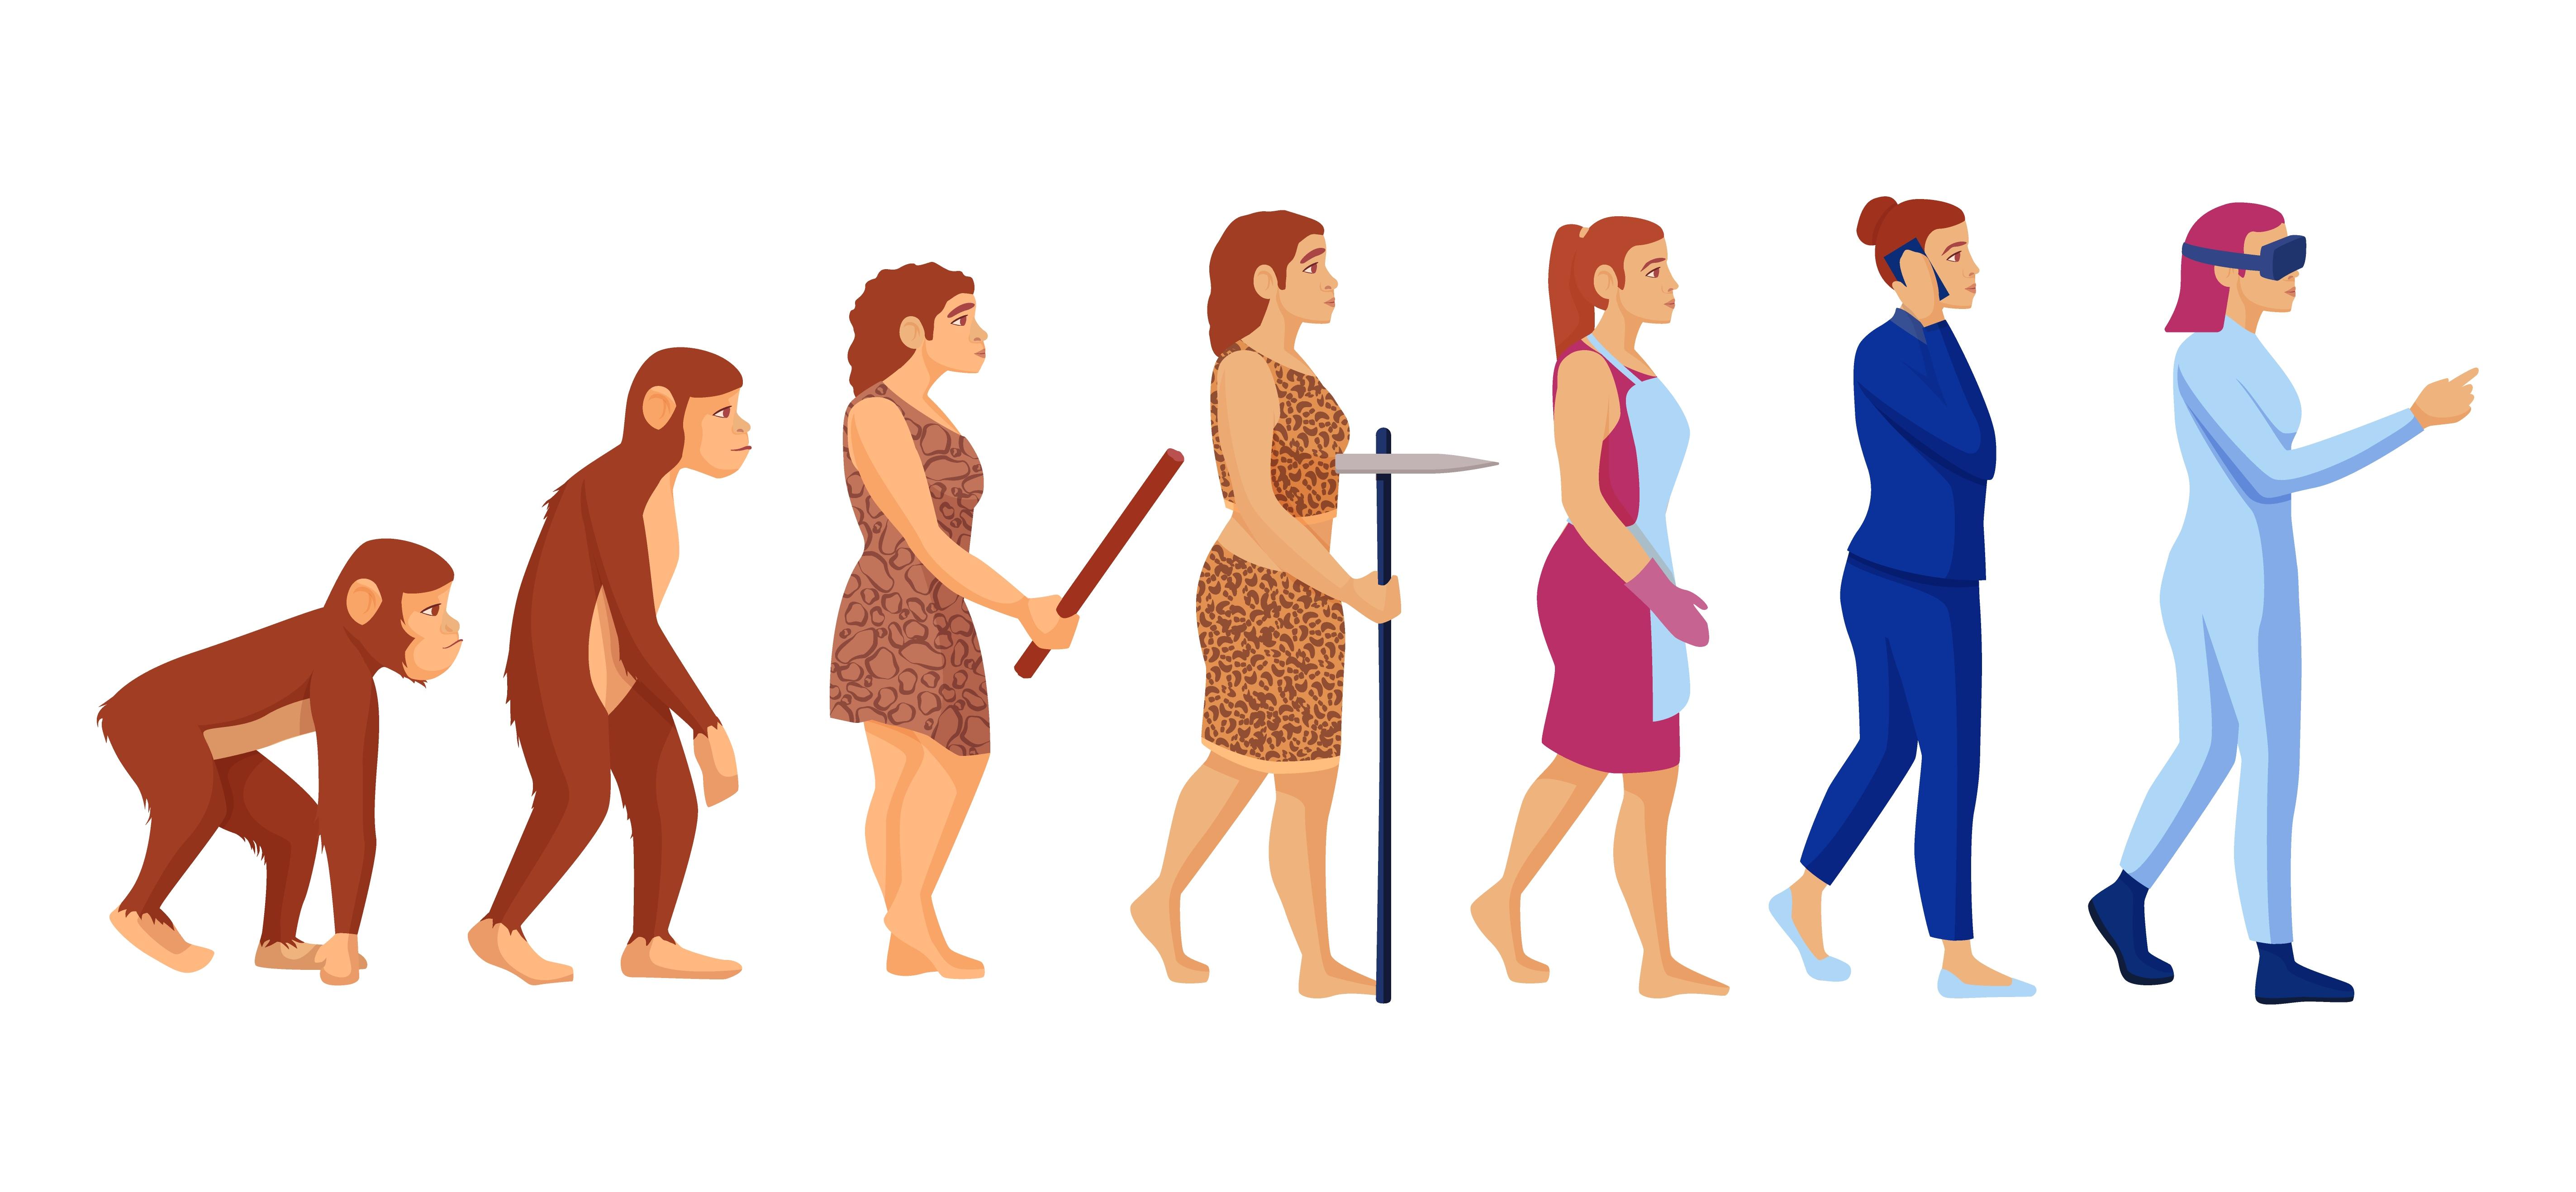 Cartoon Character Woman Career Evolution Concept Download Free Vectors Clipart Graphics Vector Art